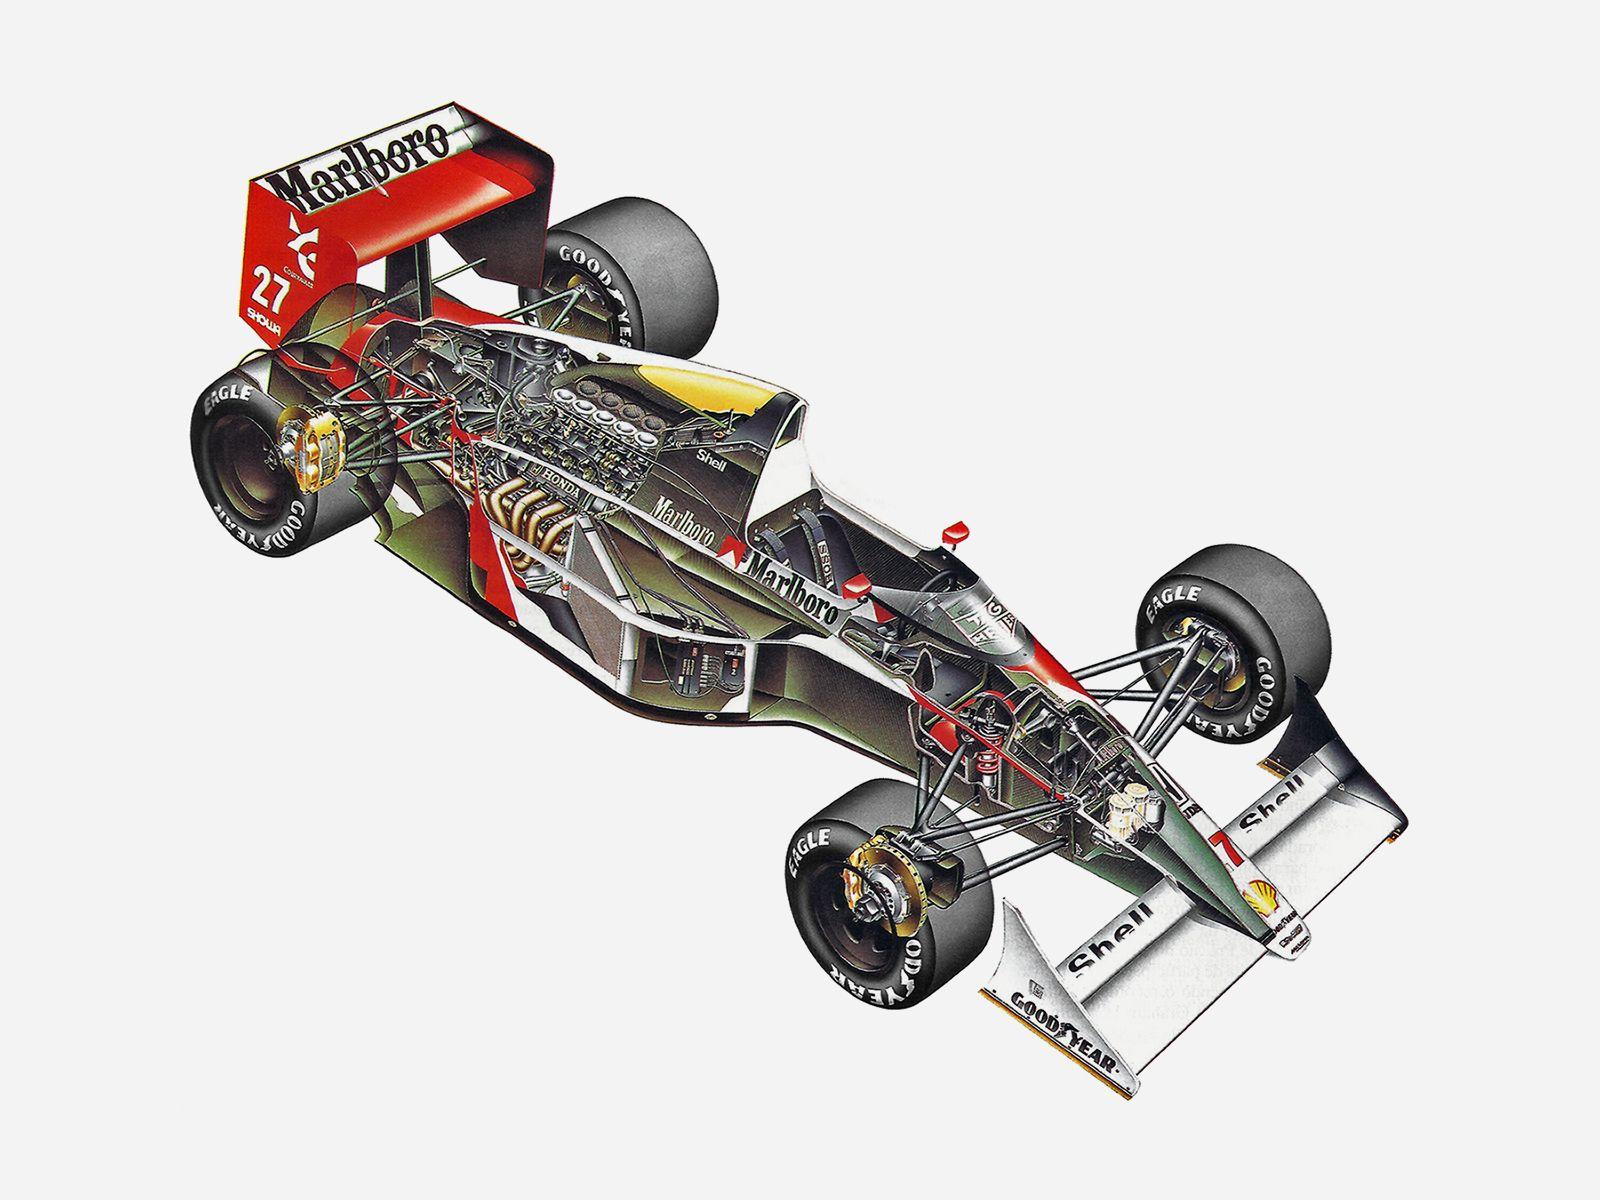 1990 McLaren Honda MP4-5B - Illustration by Antonio Eiras